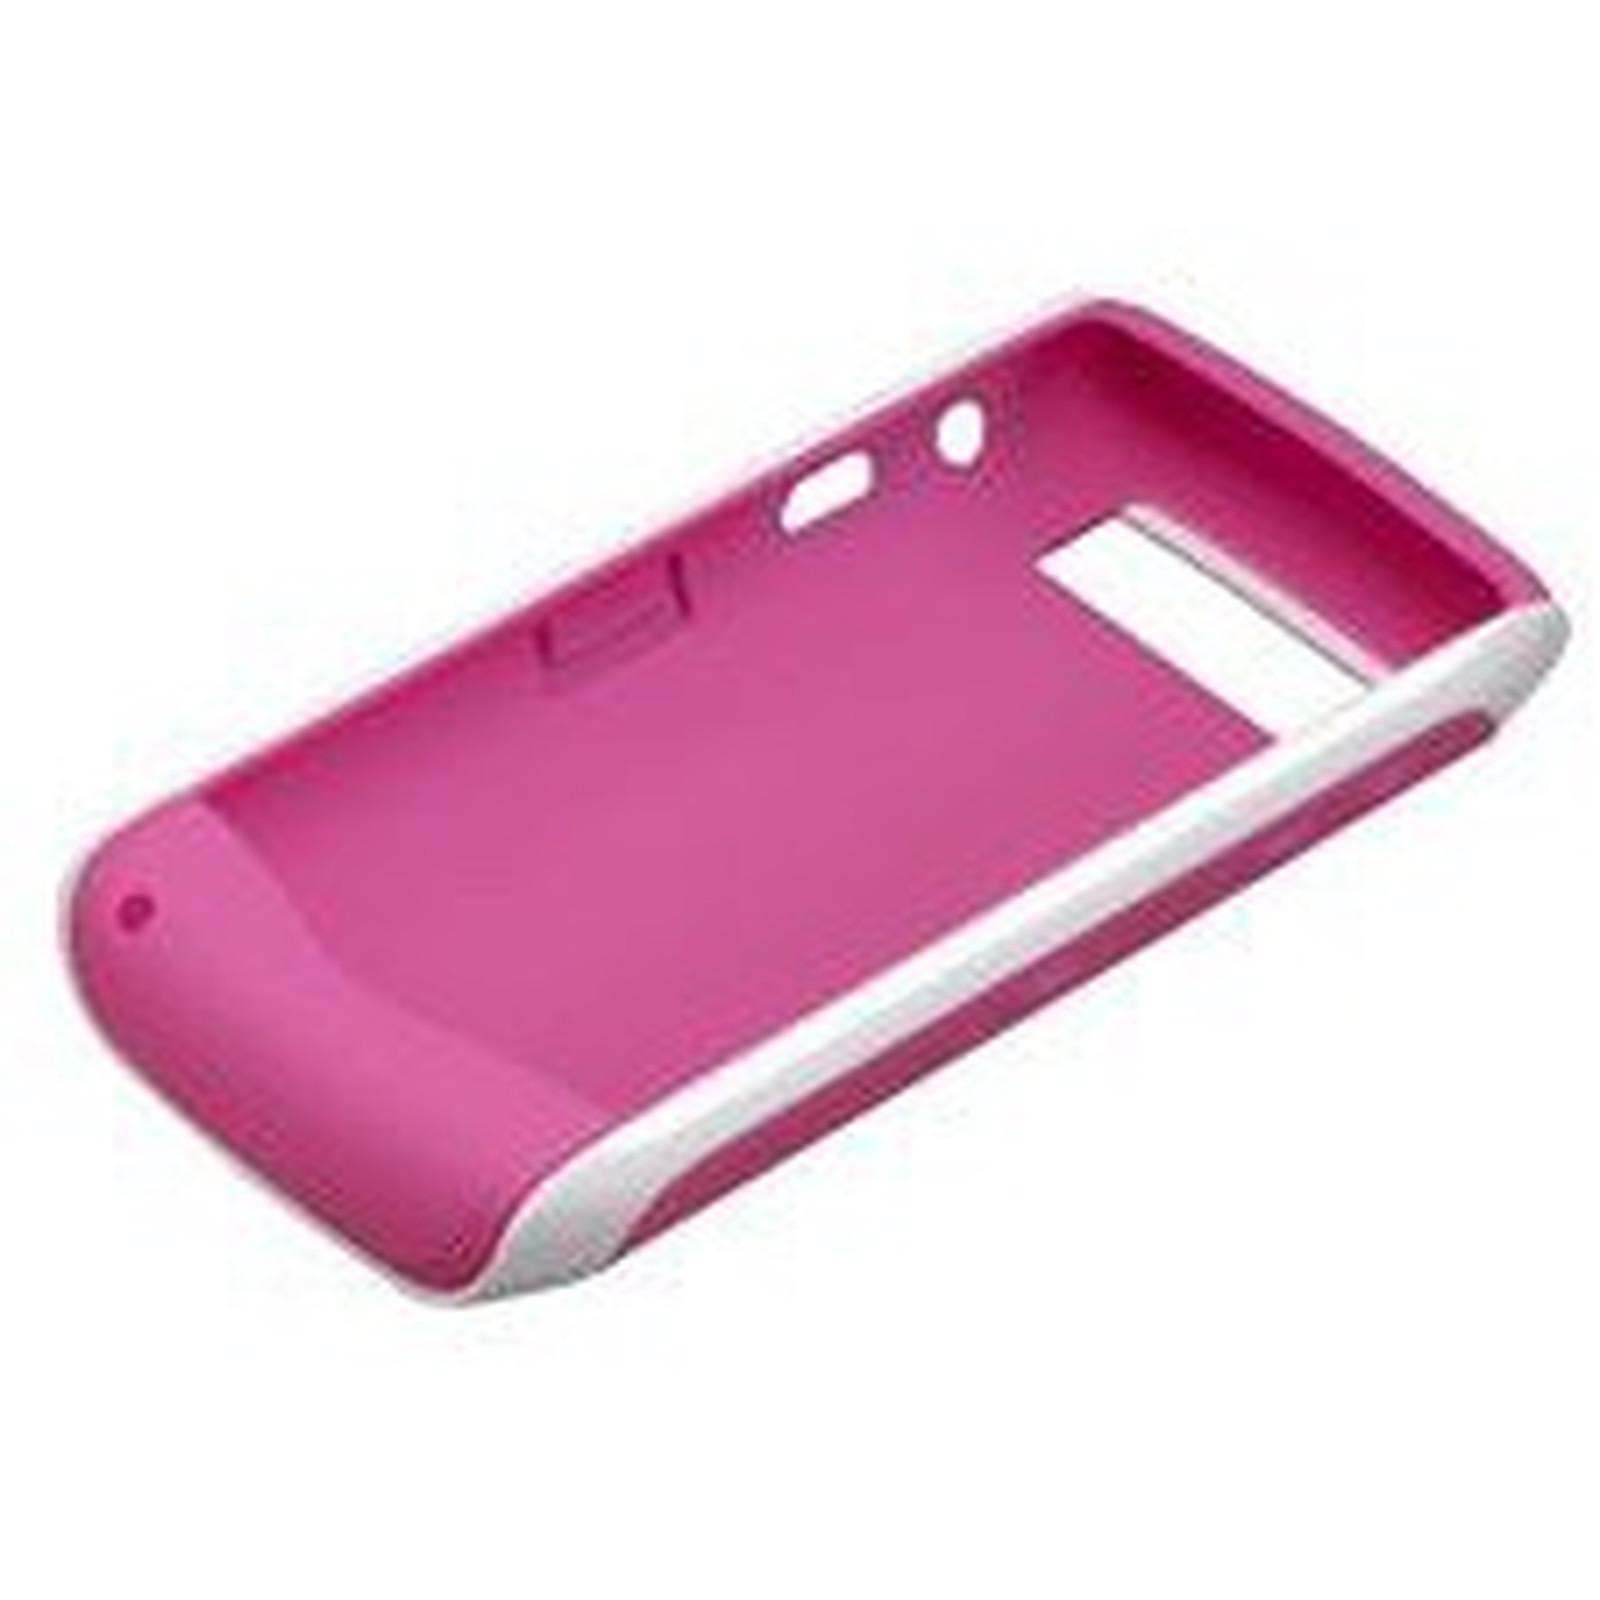 BlackBerry Premium Skin Rose pour Pearl 3G